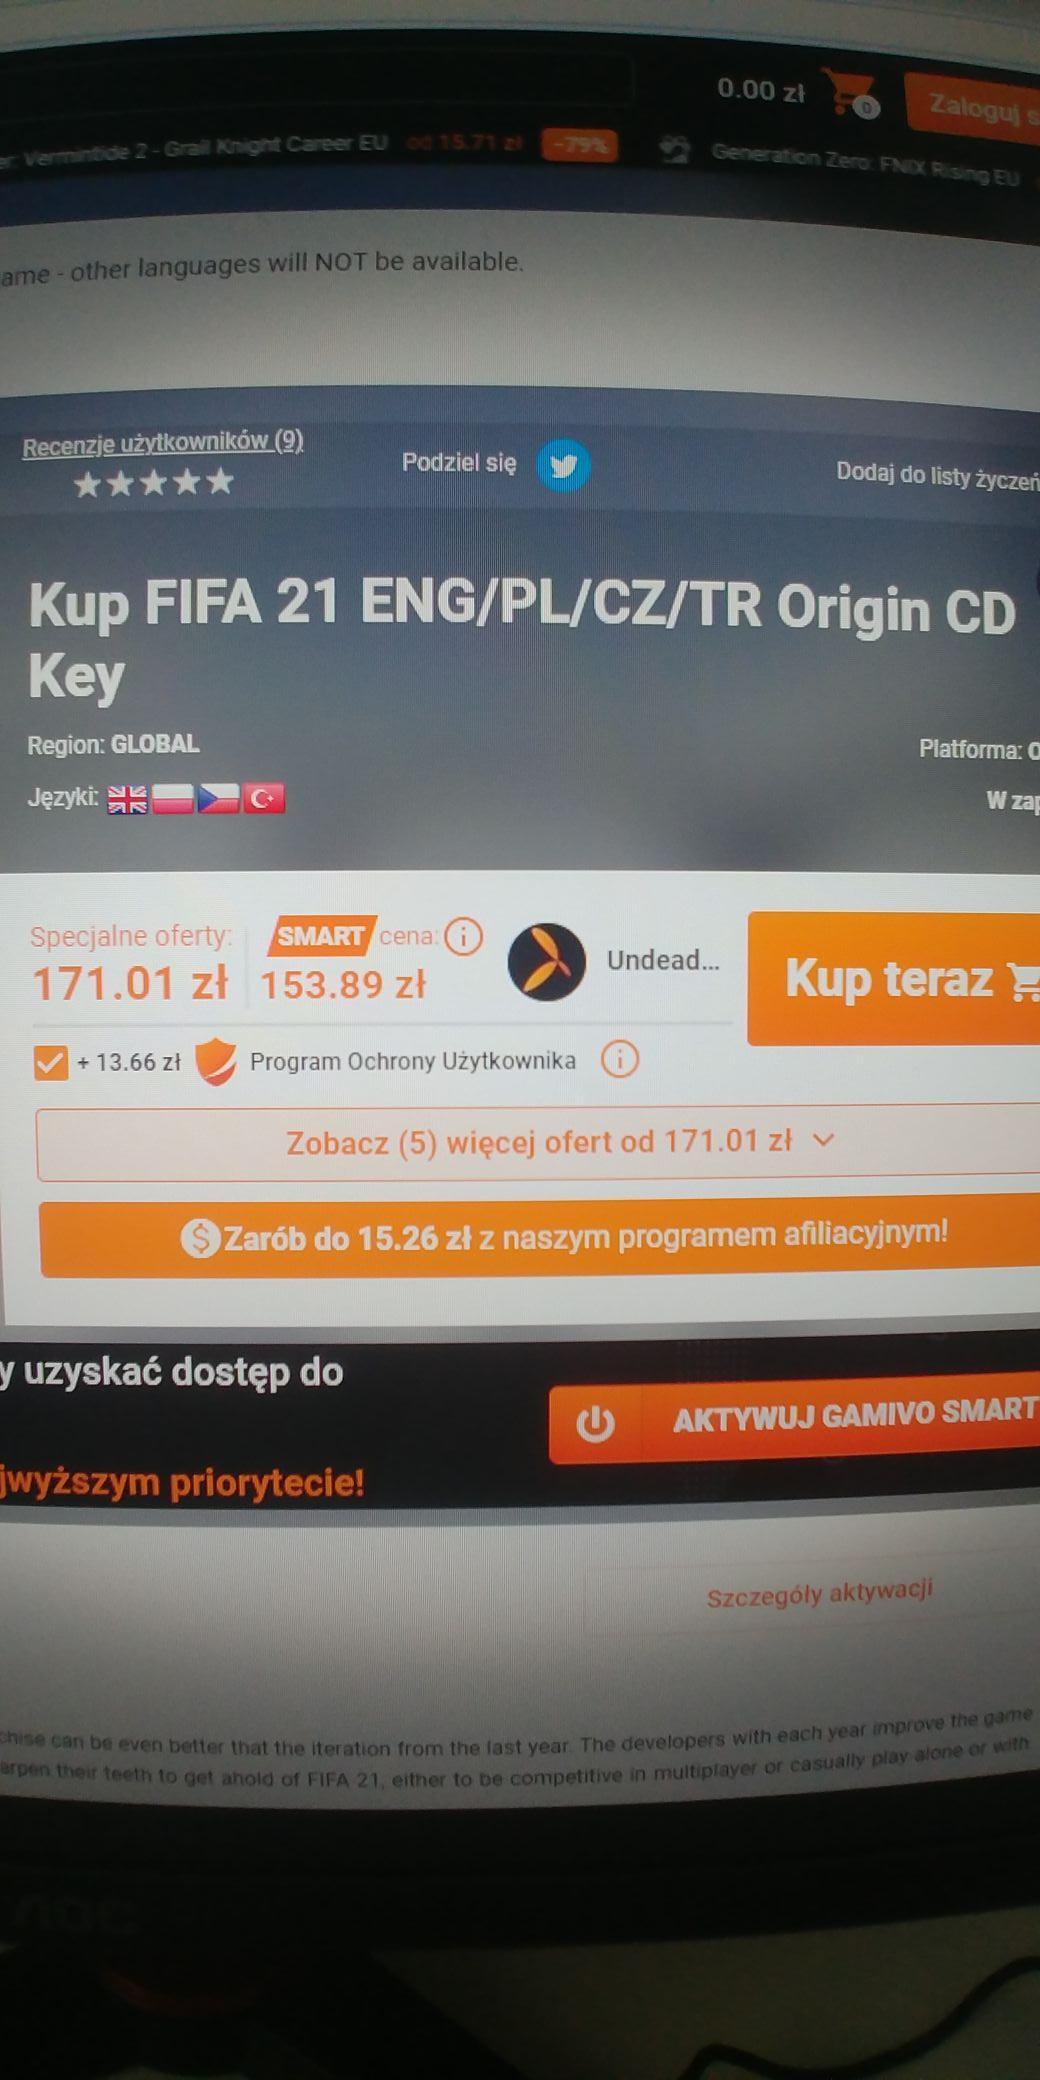 Fifa 21 pl Origin Cd key